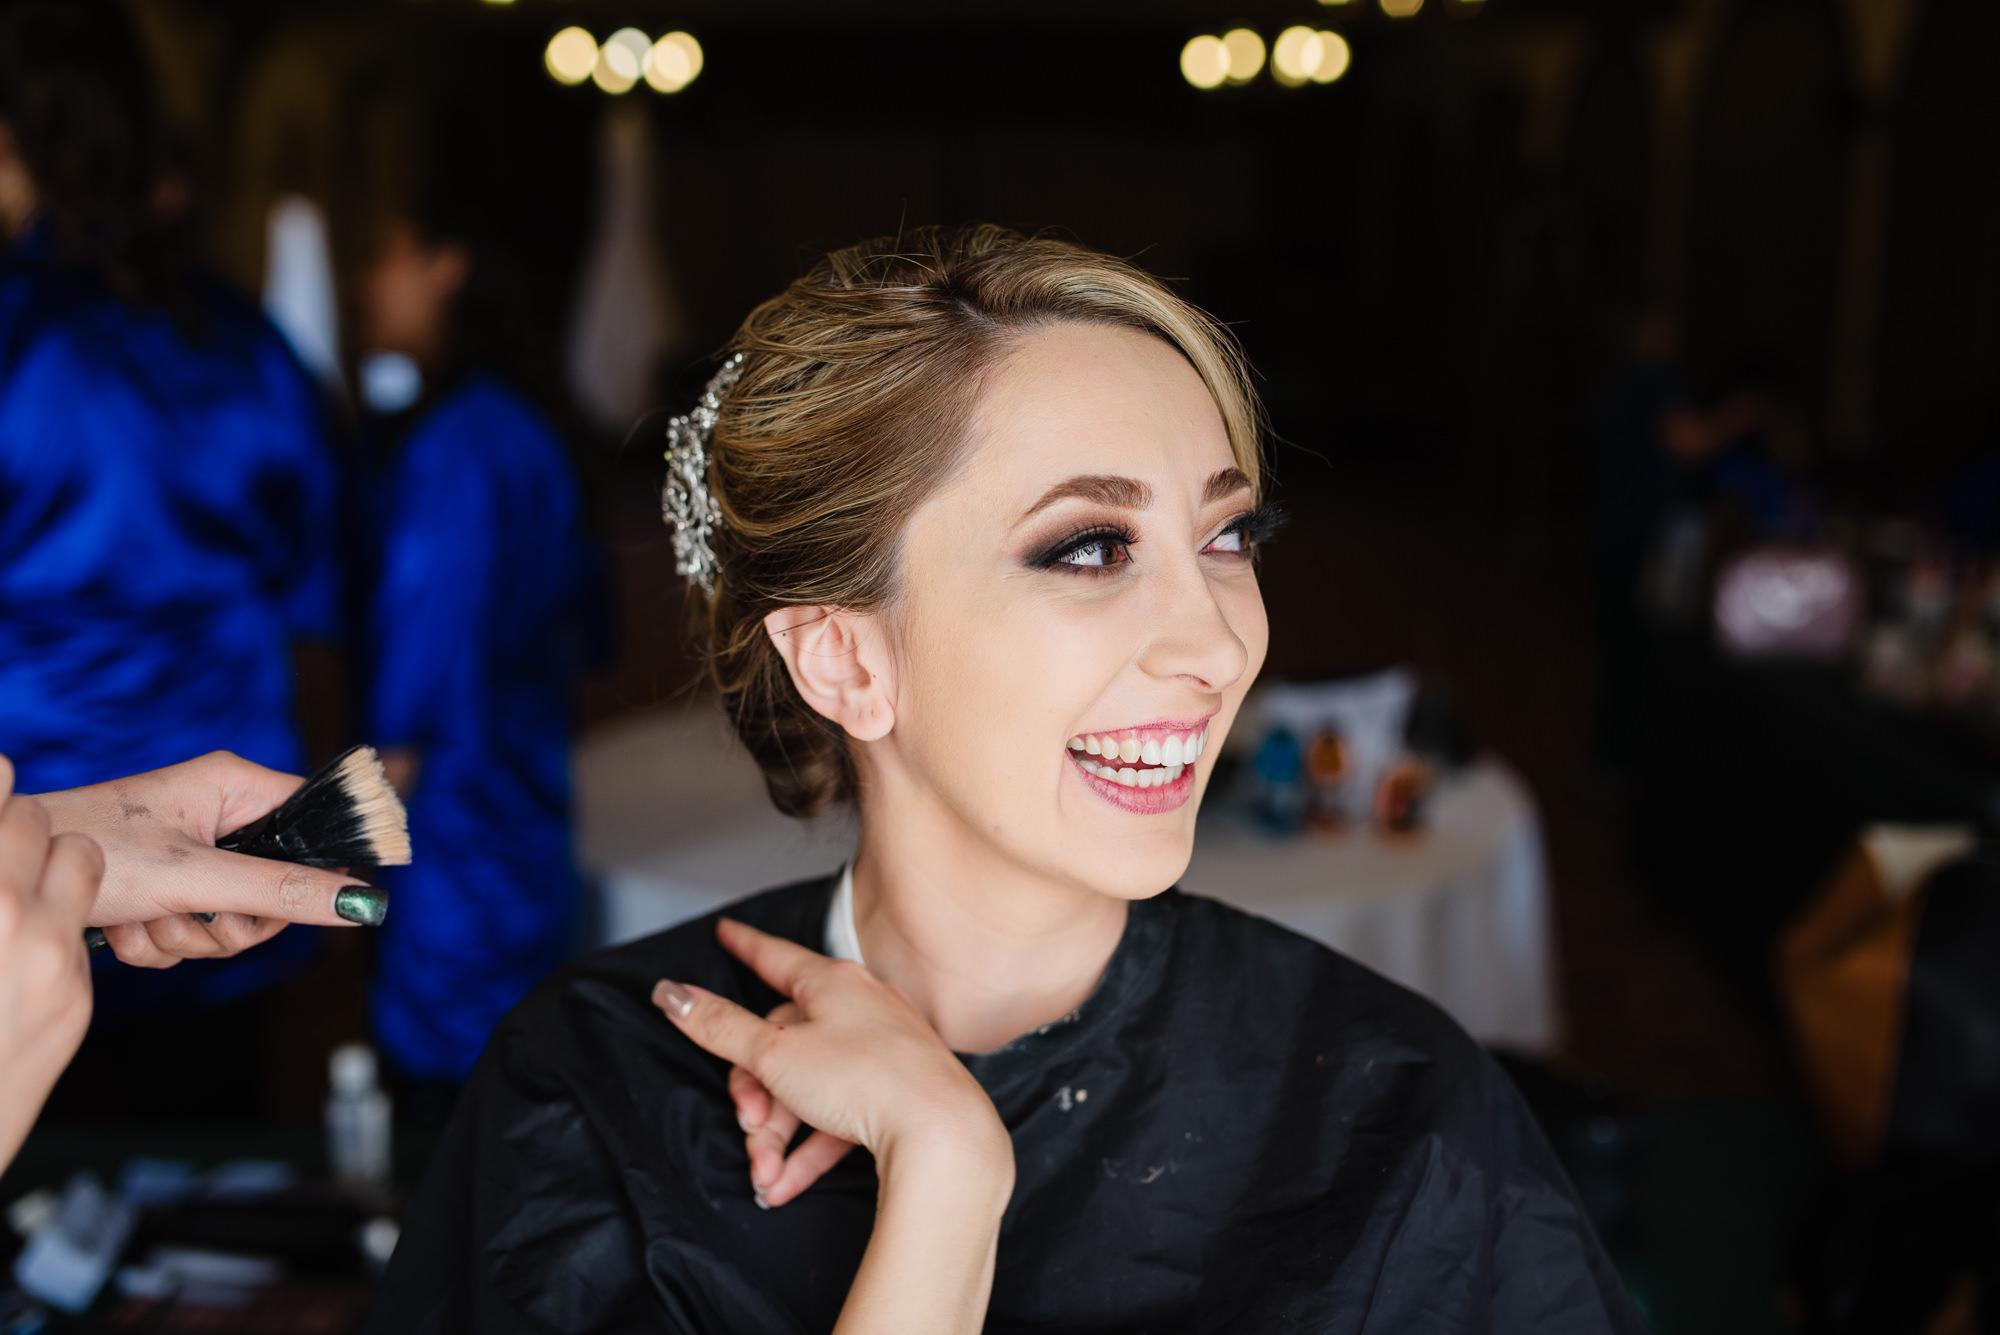 Mario-Karla-Wedding-36